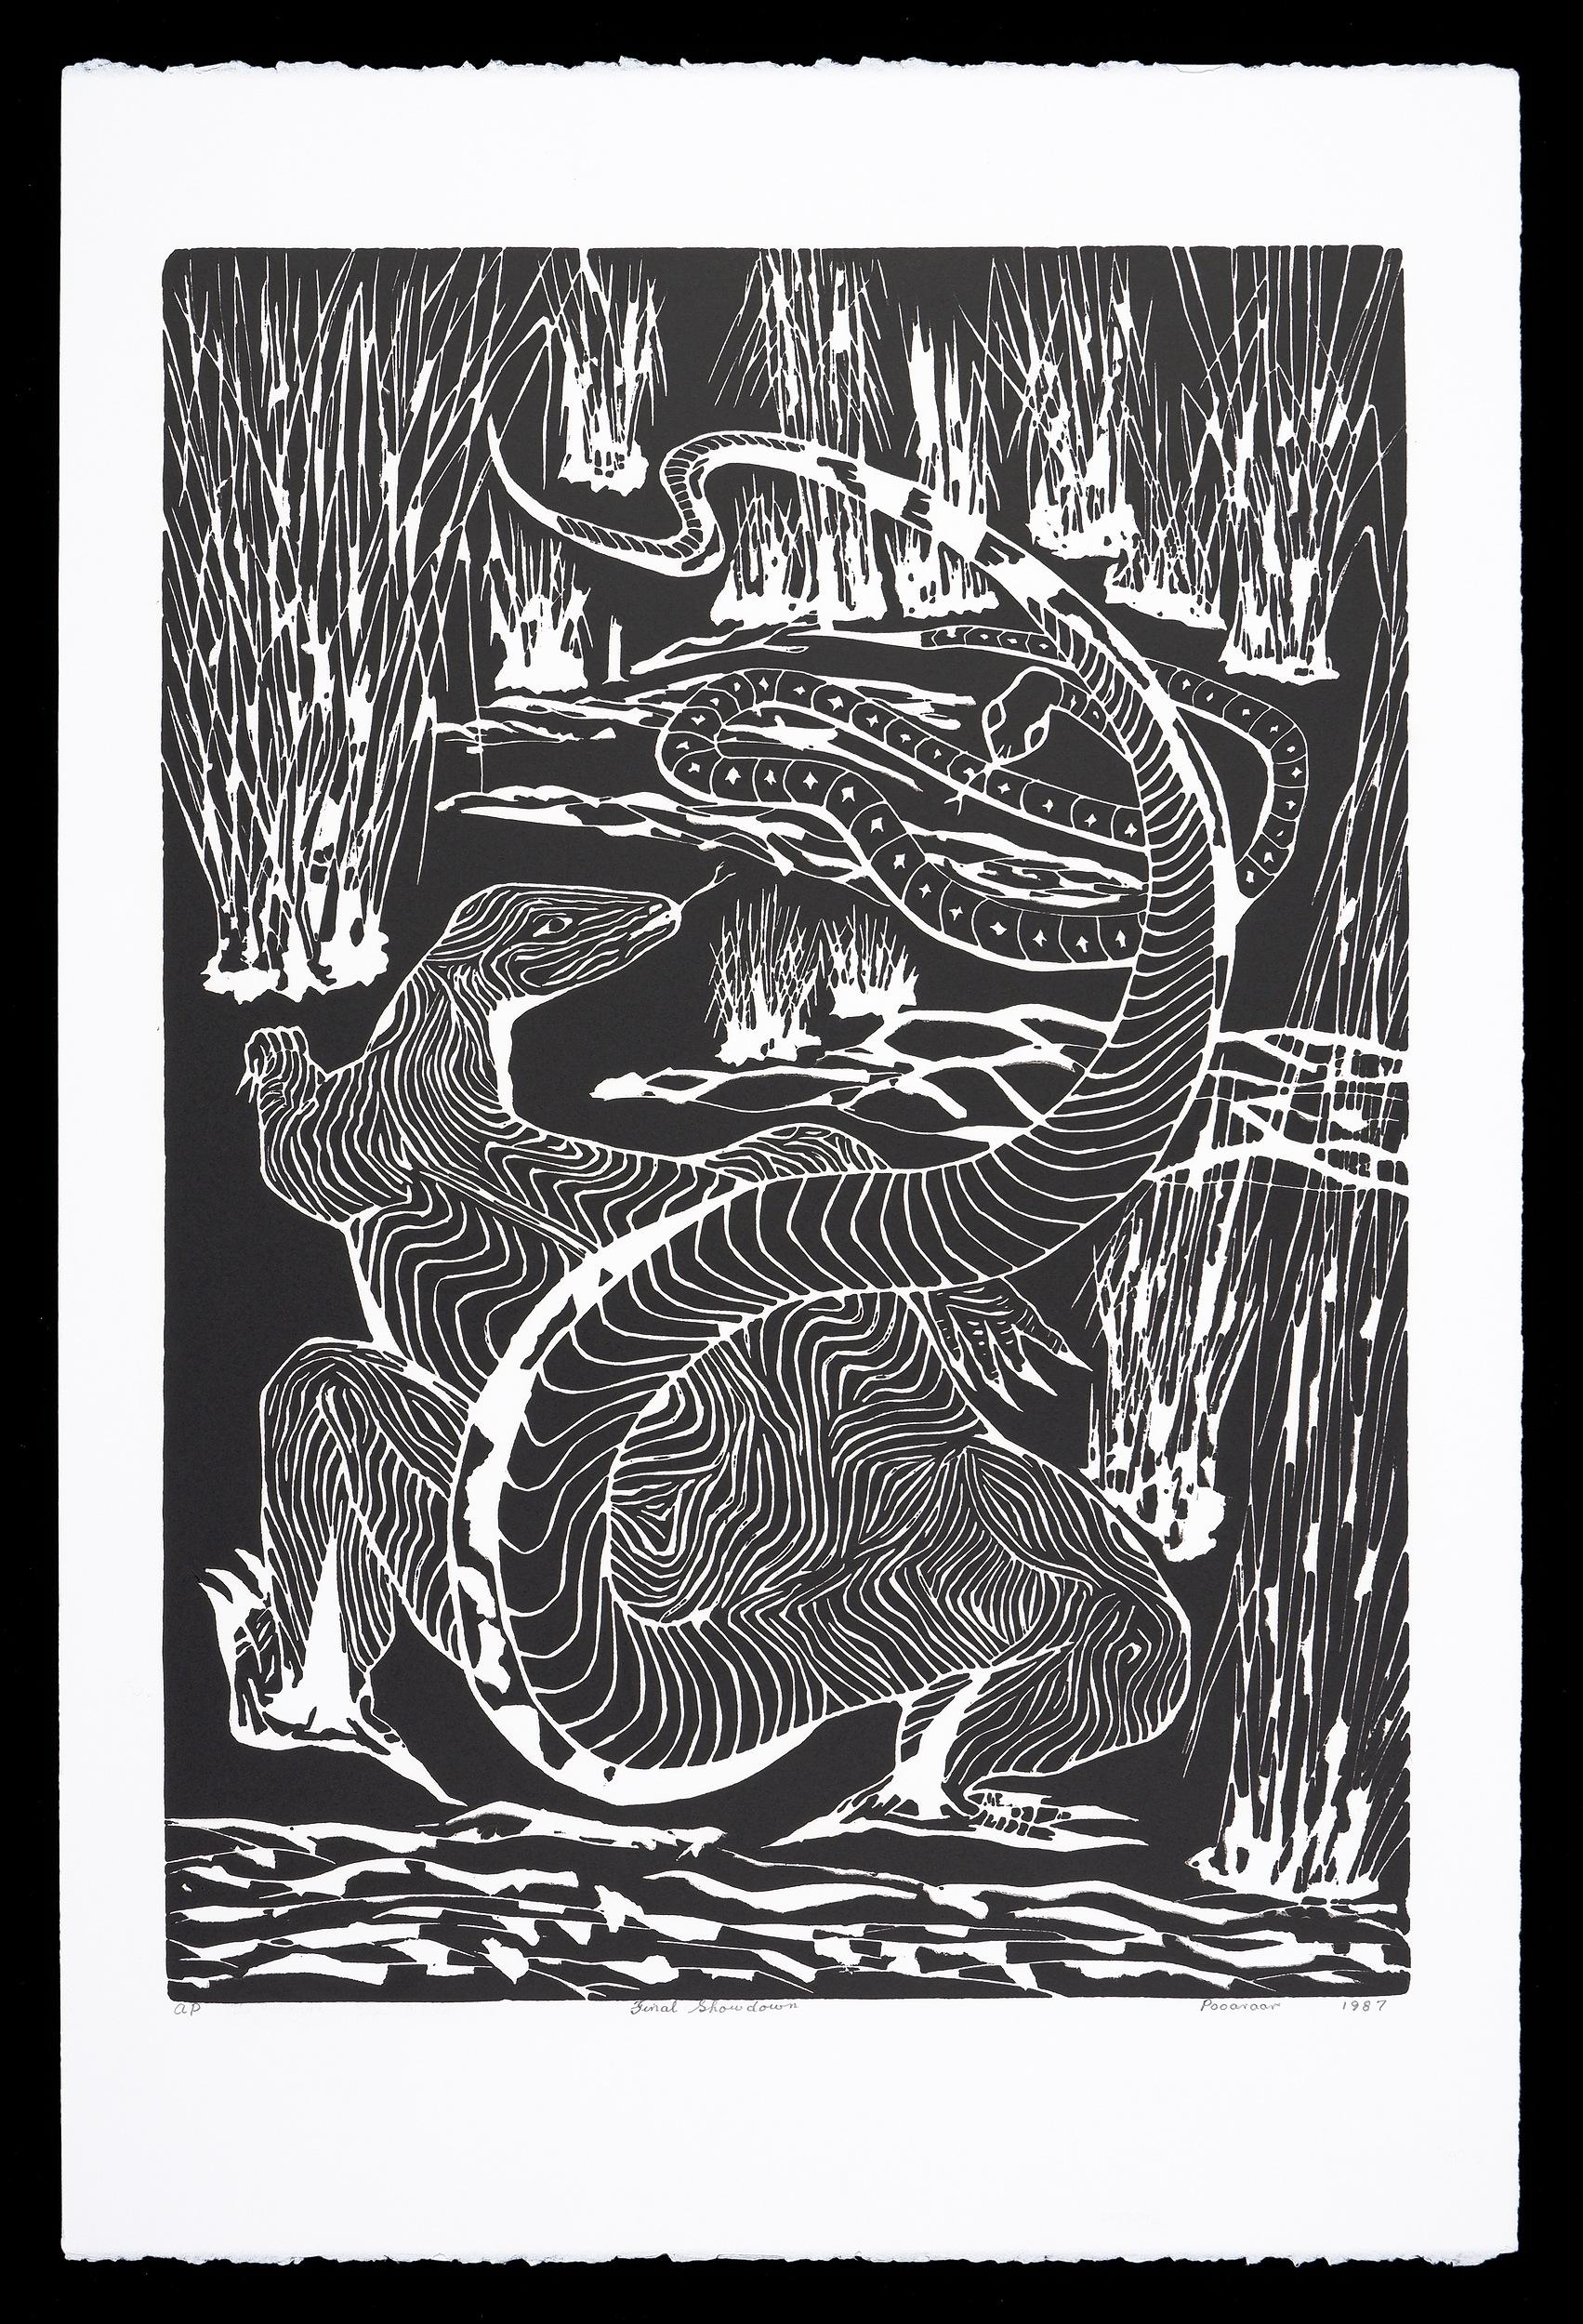 'Bevan Pooaraar Hayward (1939-2004, Goreng/Minang/Nyoongar peoples), Final Showdown 1987, Linocut, Artists Proof, Edition of 40, 46 x 32 cm (image size)'